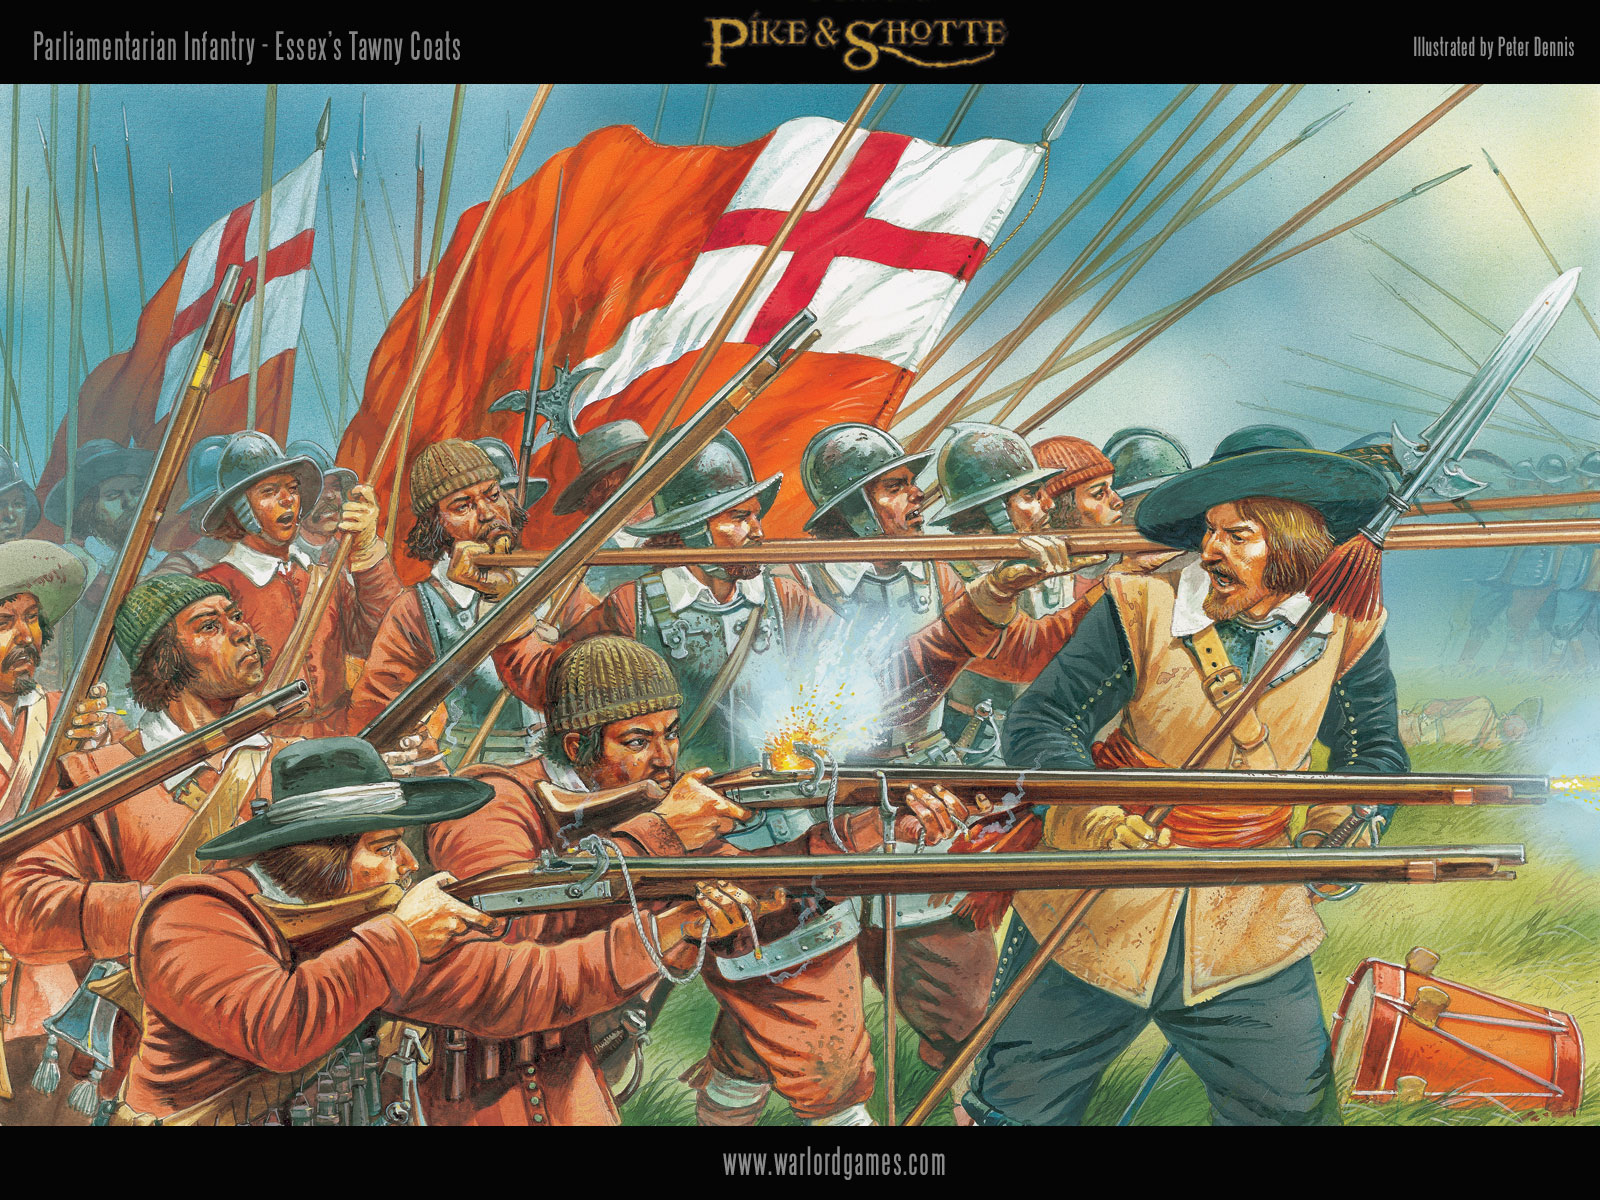 Illustrations P&S ECW-Parliament-Infantry-wallpaper